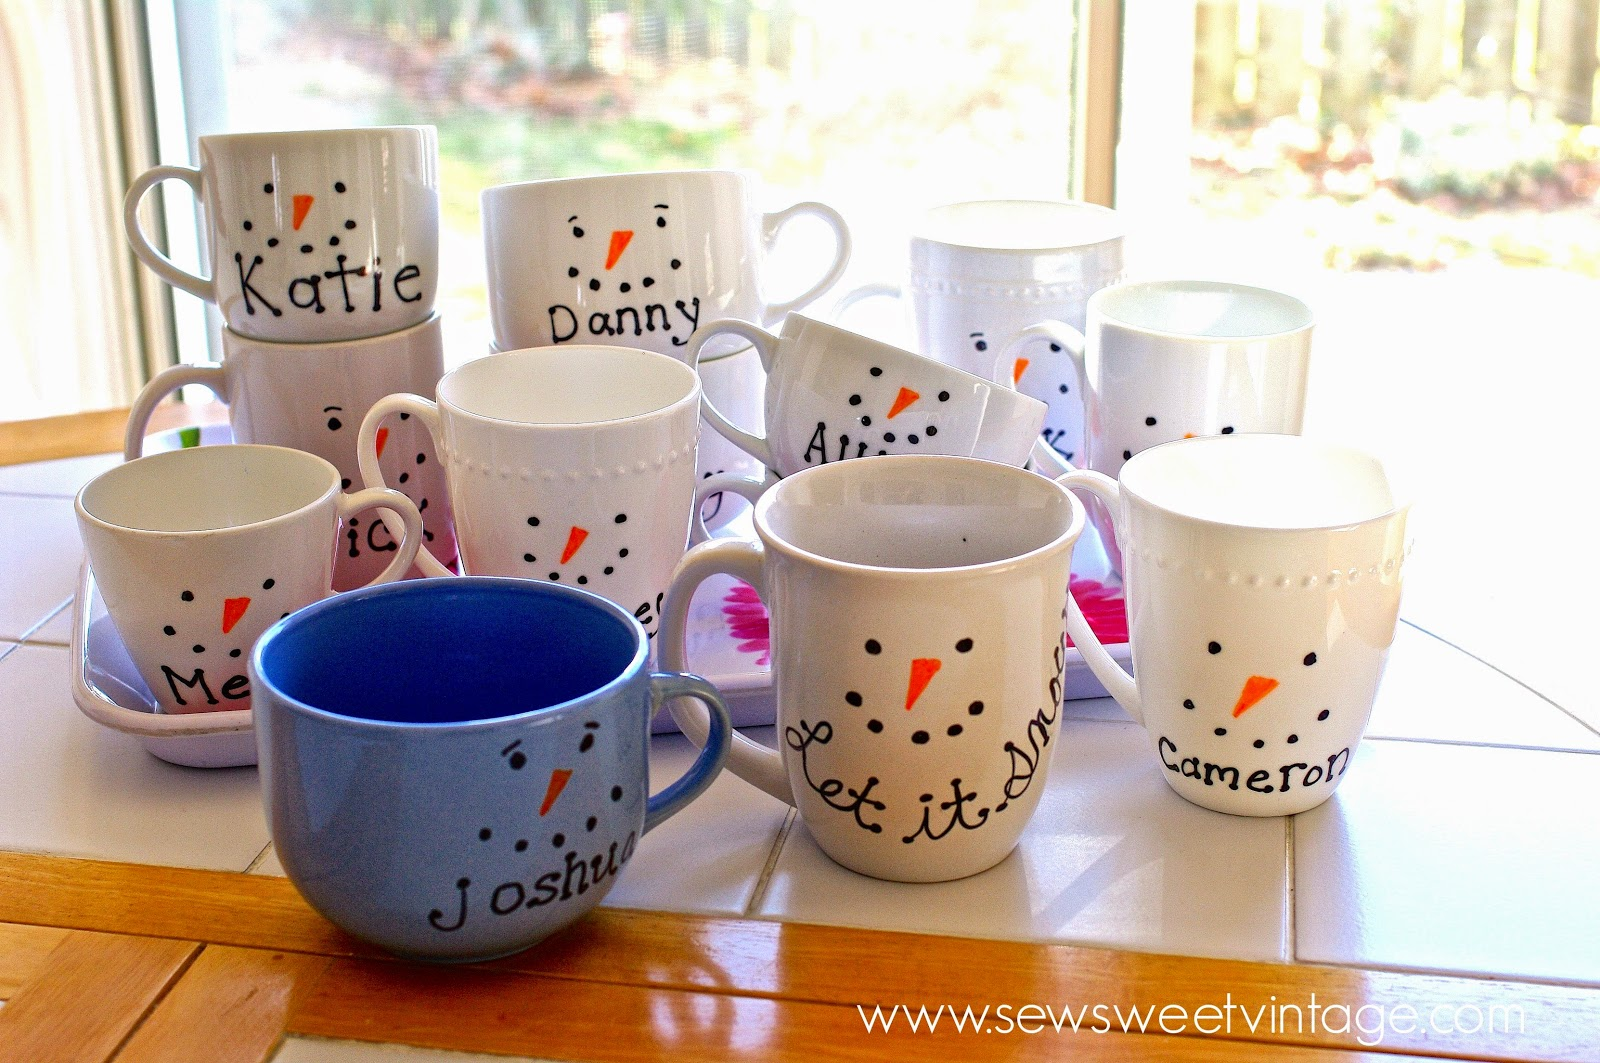 Sew Sweet Vintage: sharpie snowman mug